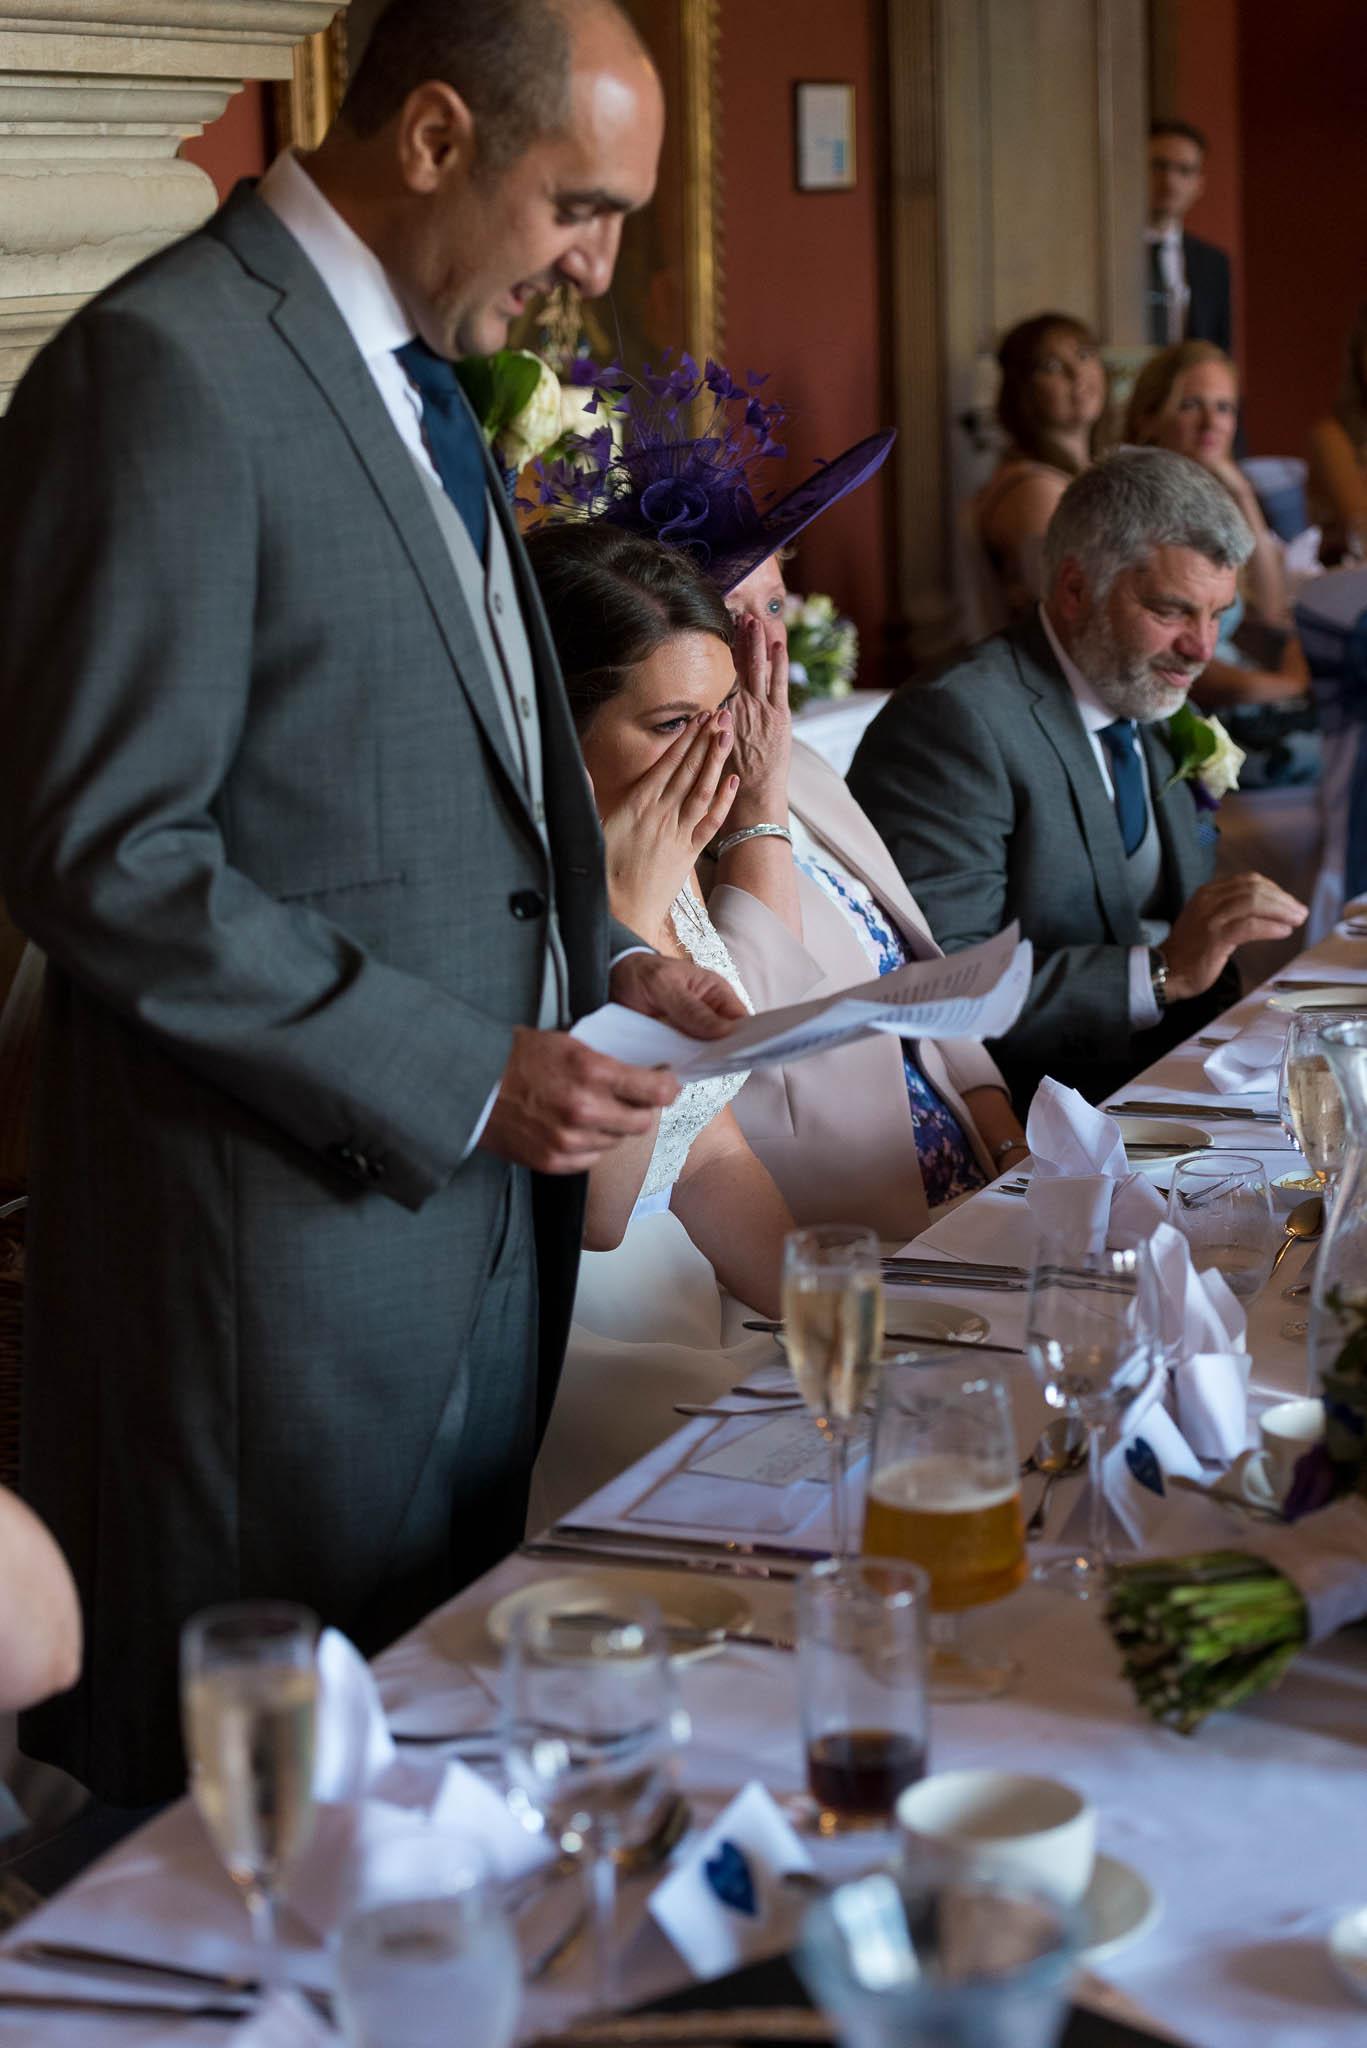 Crathorne Hall Hotel Wedding Photographer83.jpg